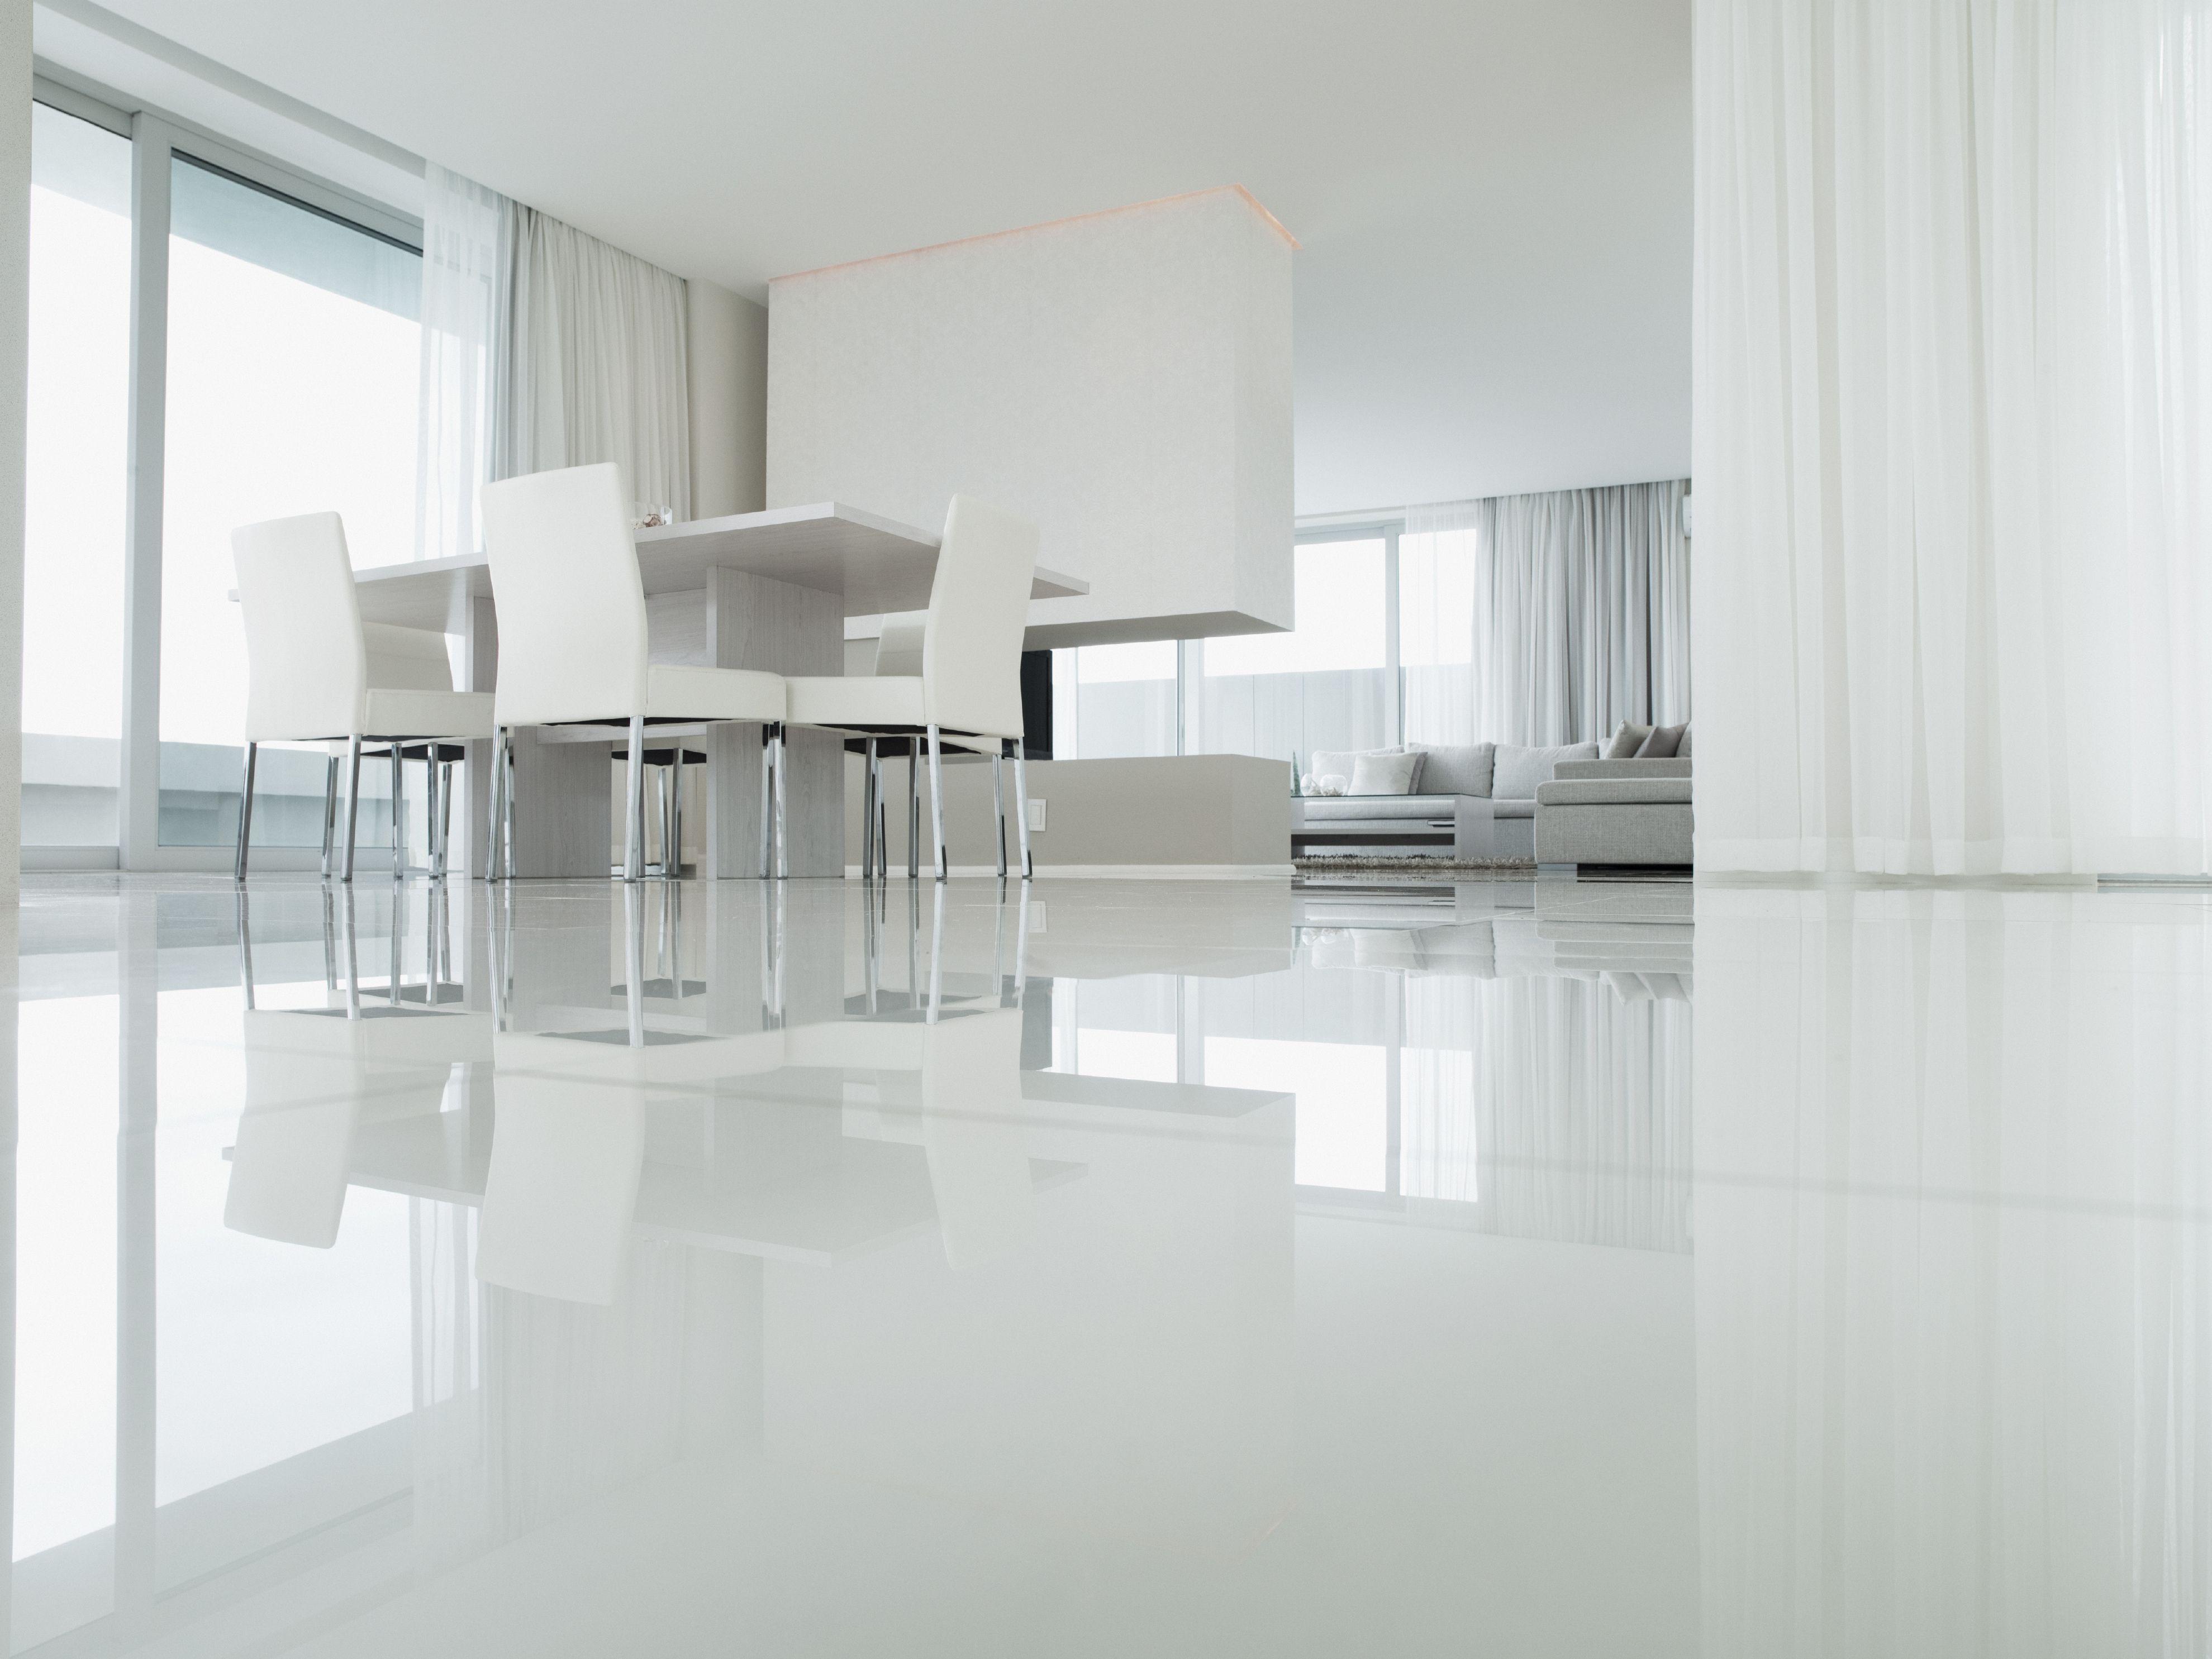 Exquisite White Flooring Floors Pinterest White flooring and